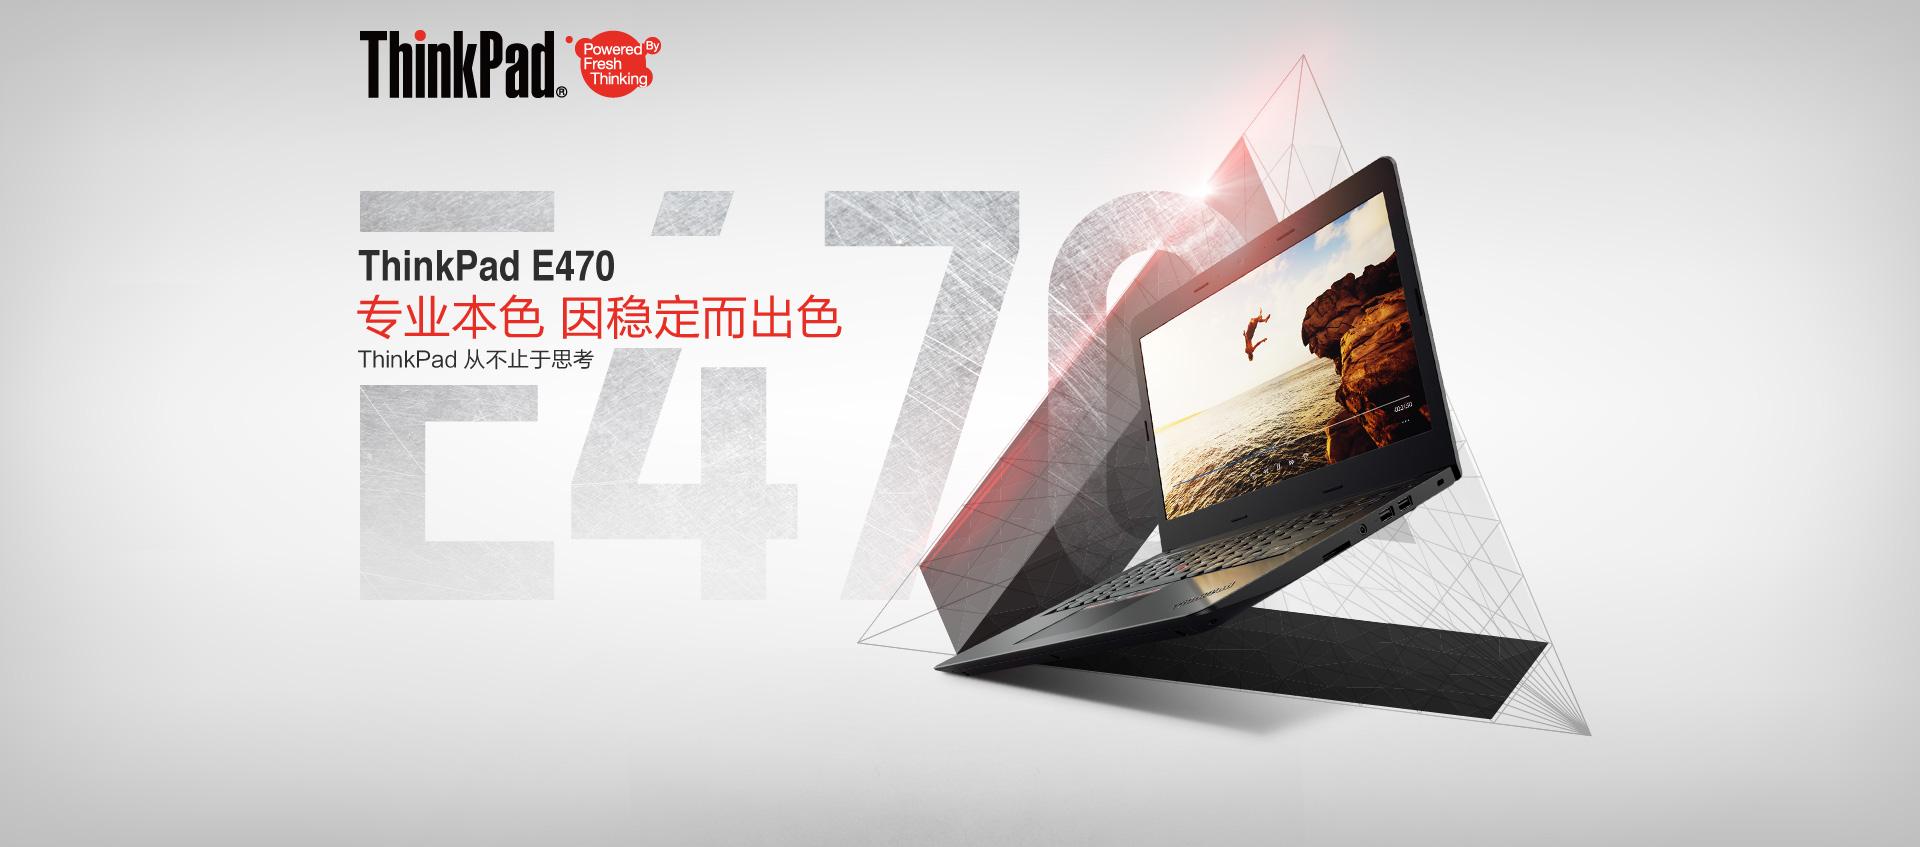 ThinkPad E470-11.jpg